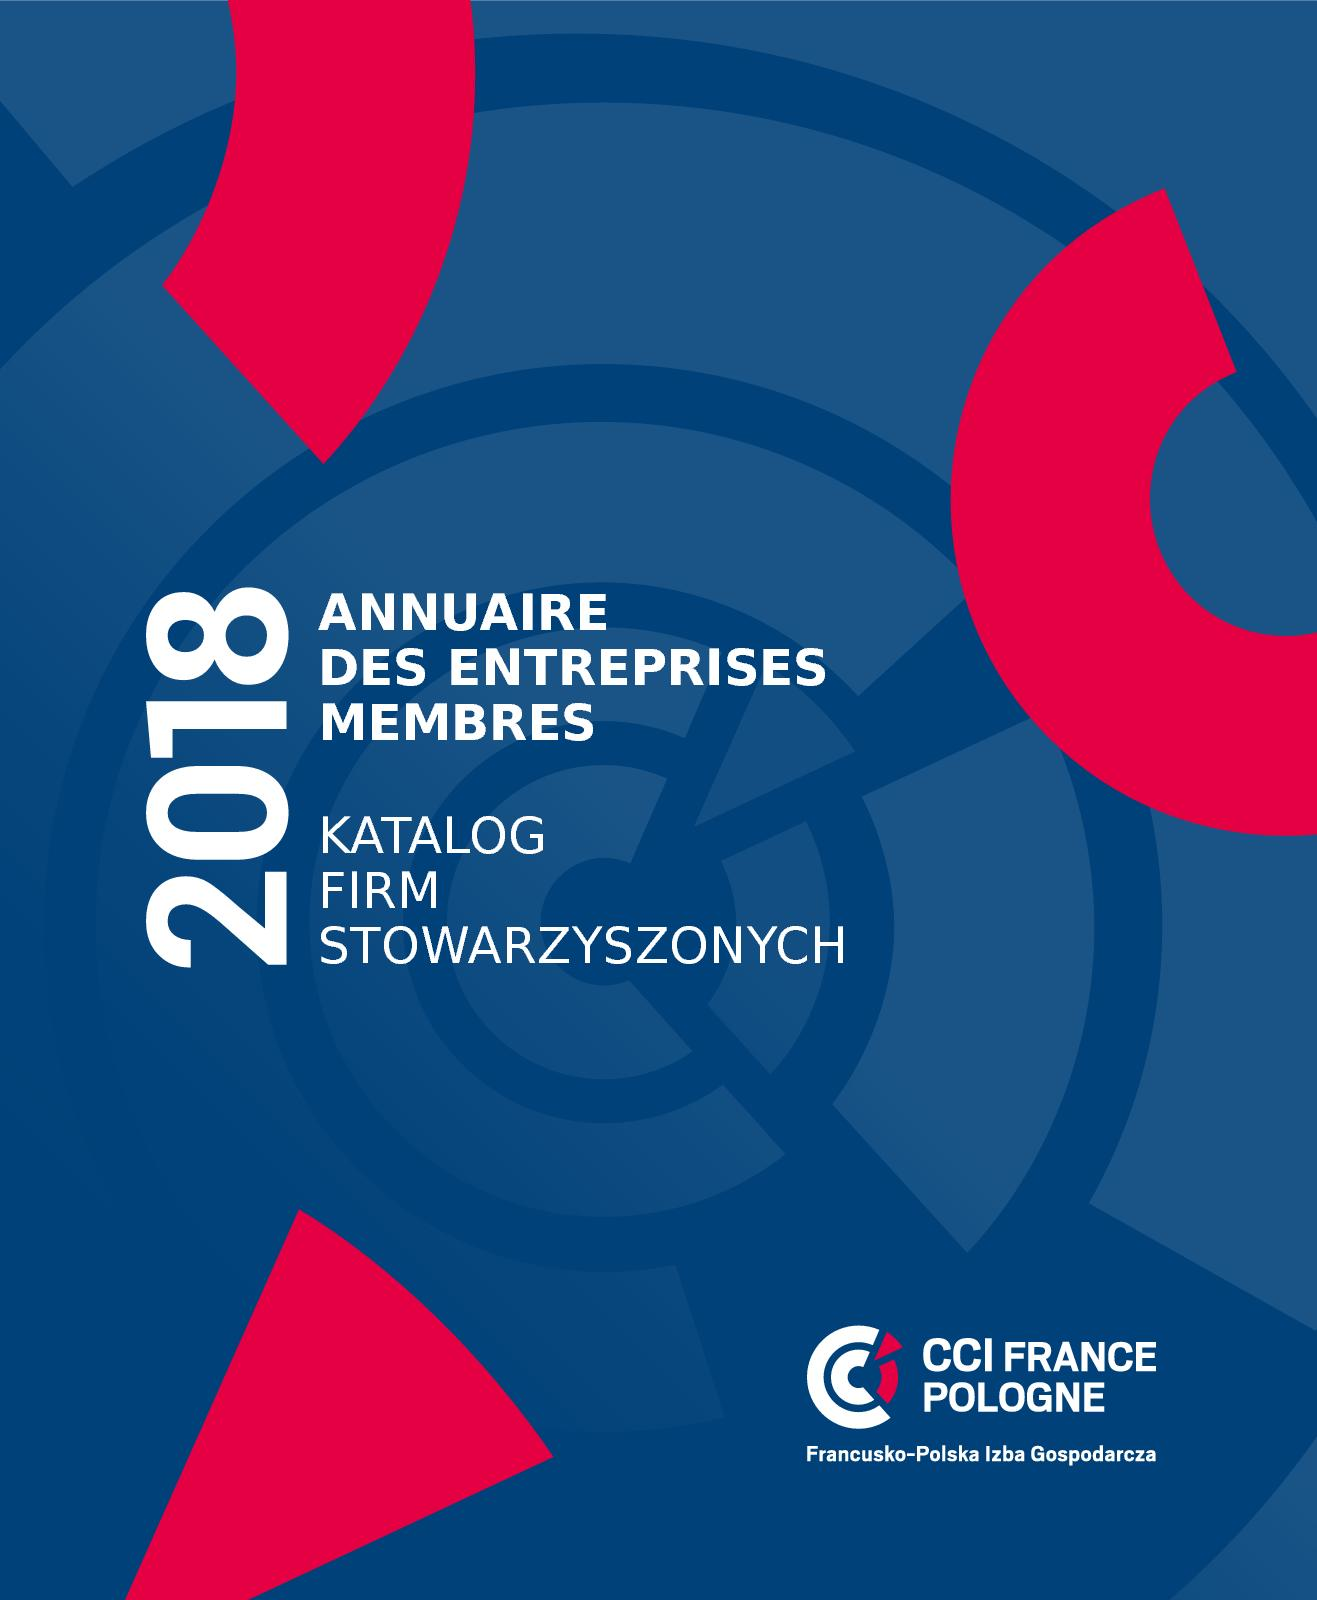 96ef0a67526de Calaméo - Katalog CCIFP 2018 / Annuaire de la CCIFP 2018